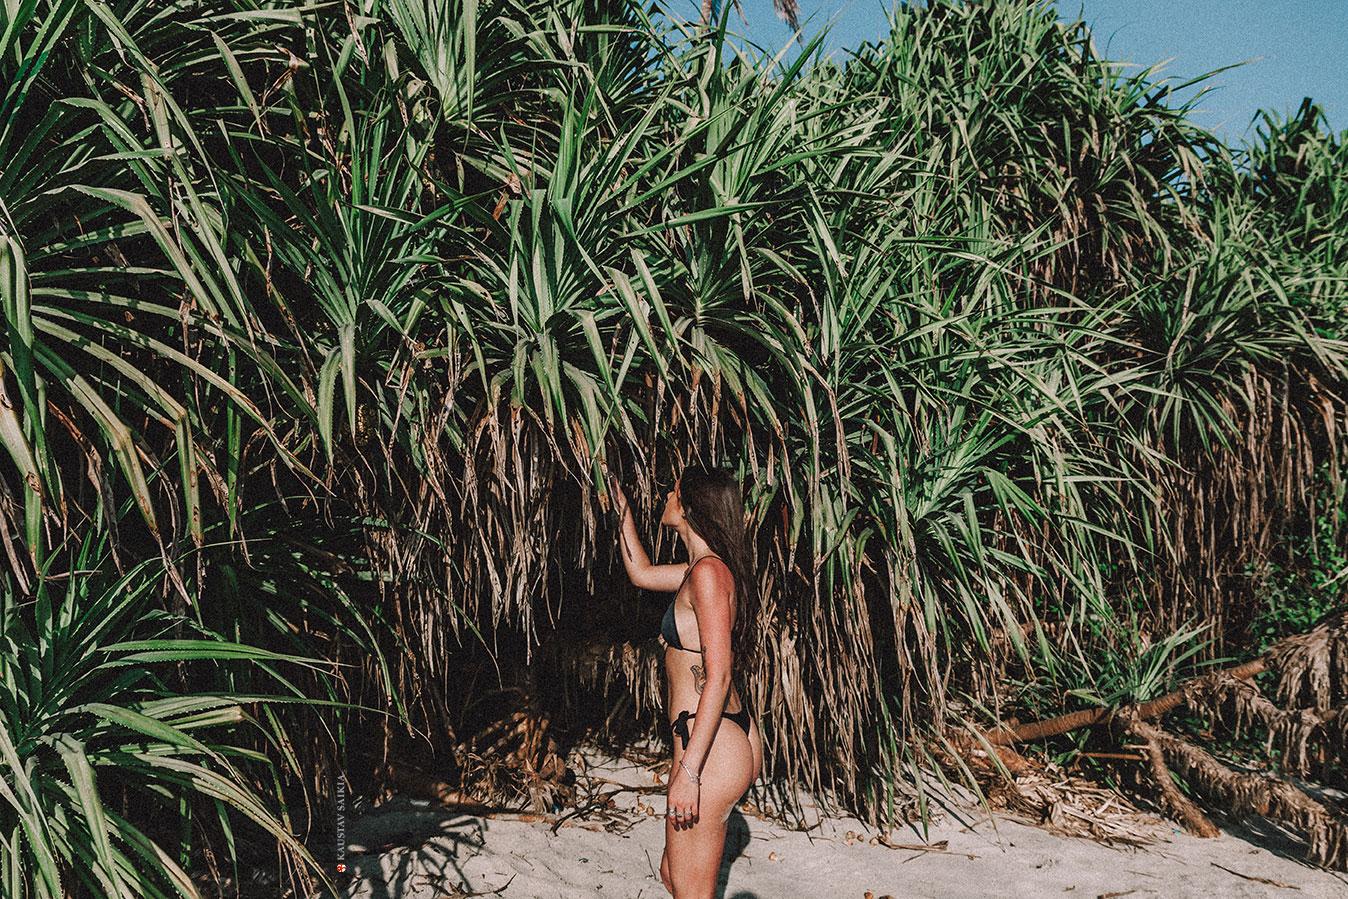 Raquel. 2019. Goa